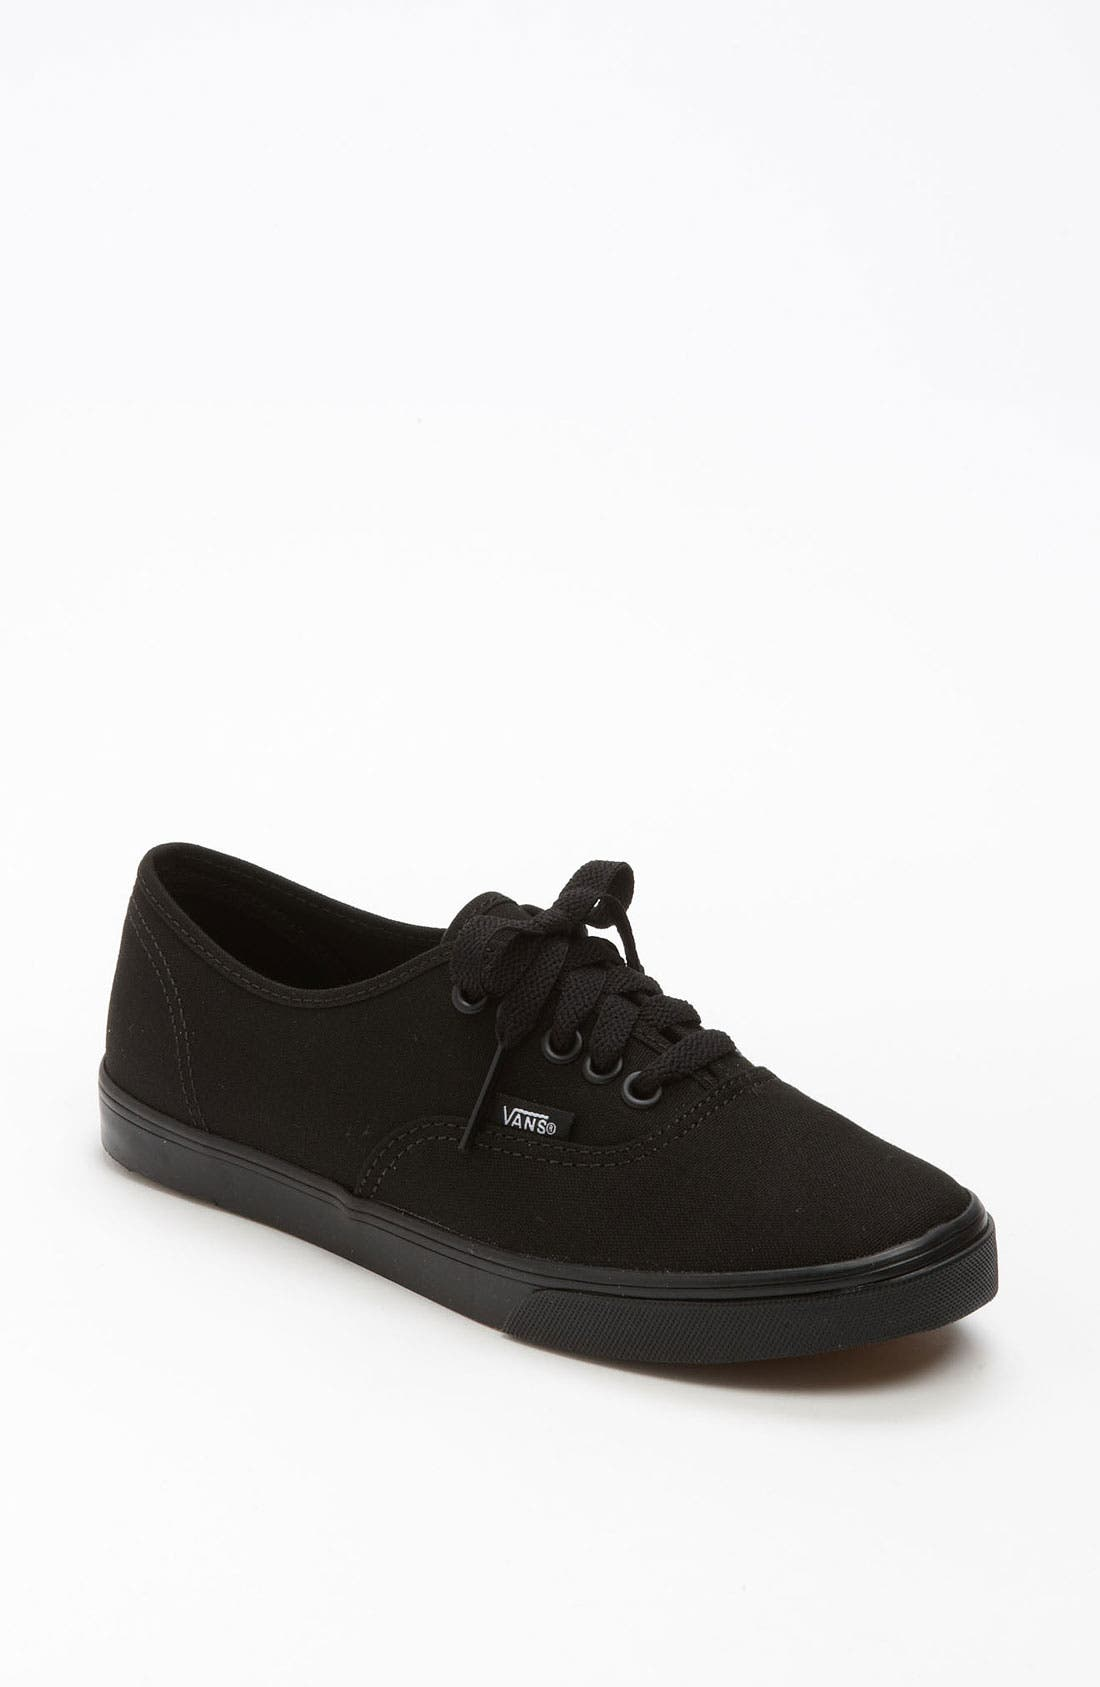 VANS 'Authentic - Lo Pro' Sneaker